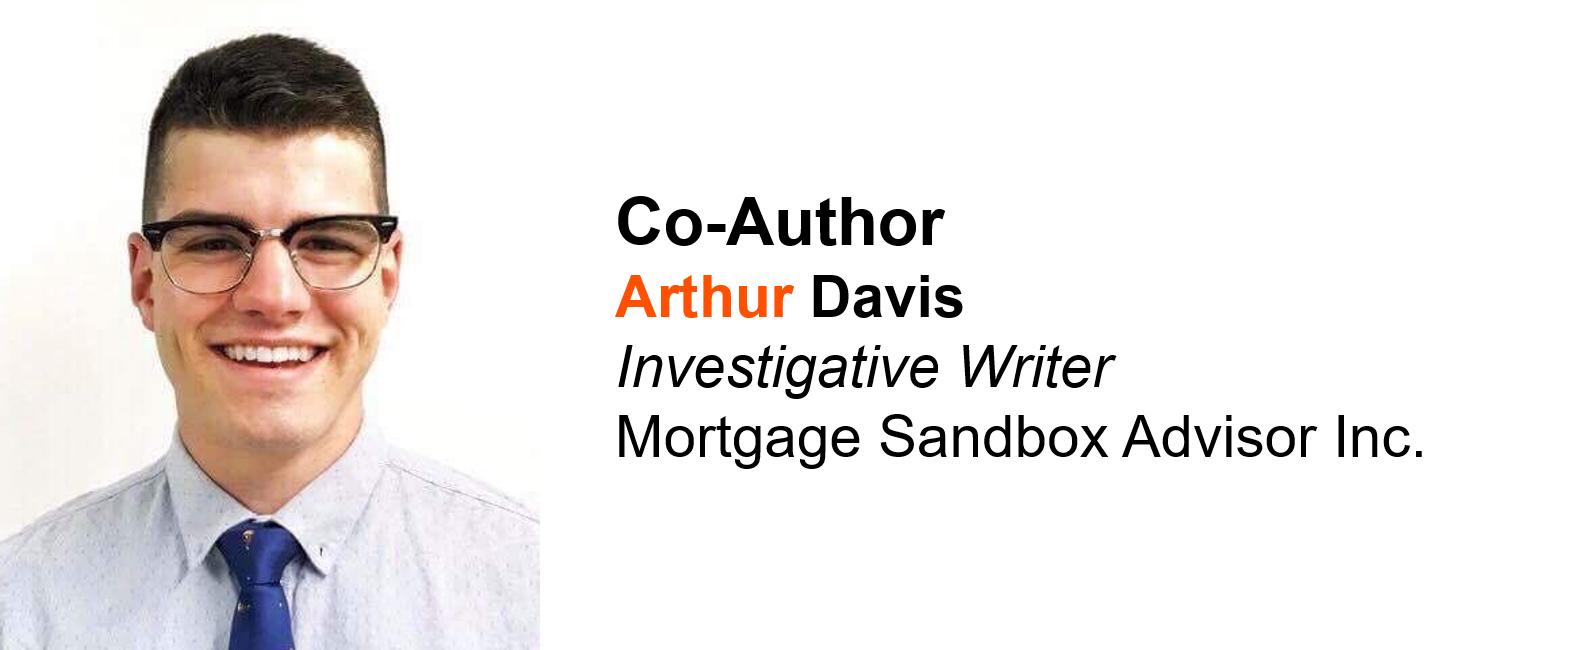 ArthurDavis-author